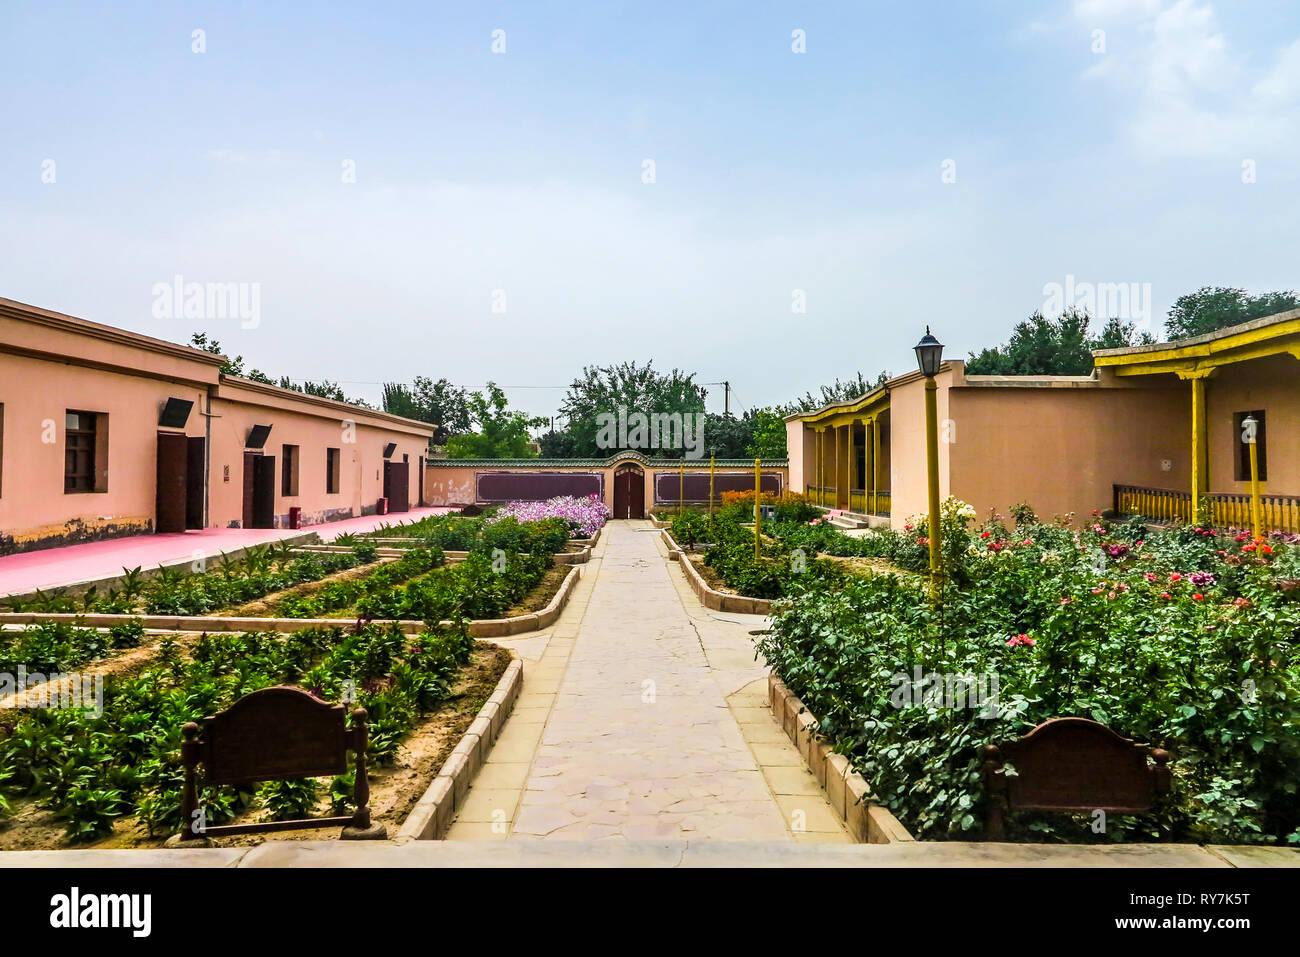 Kuche Royal King Palace Courtyard Garden Leading Lines - Stock Image